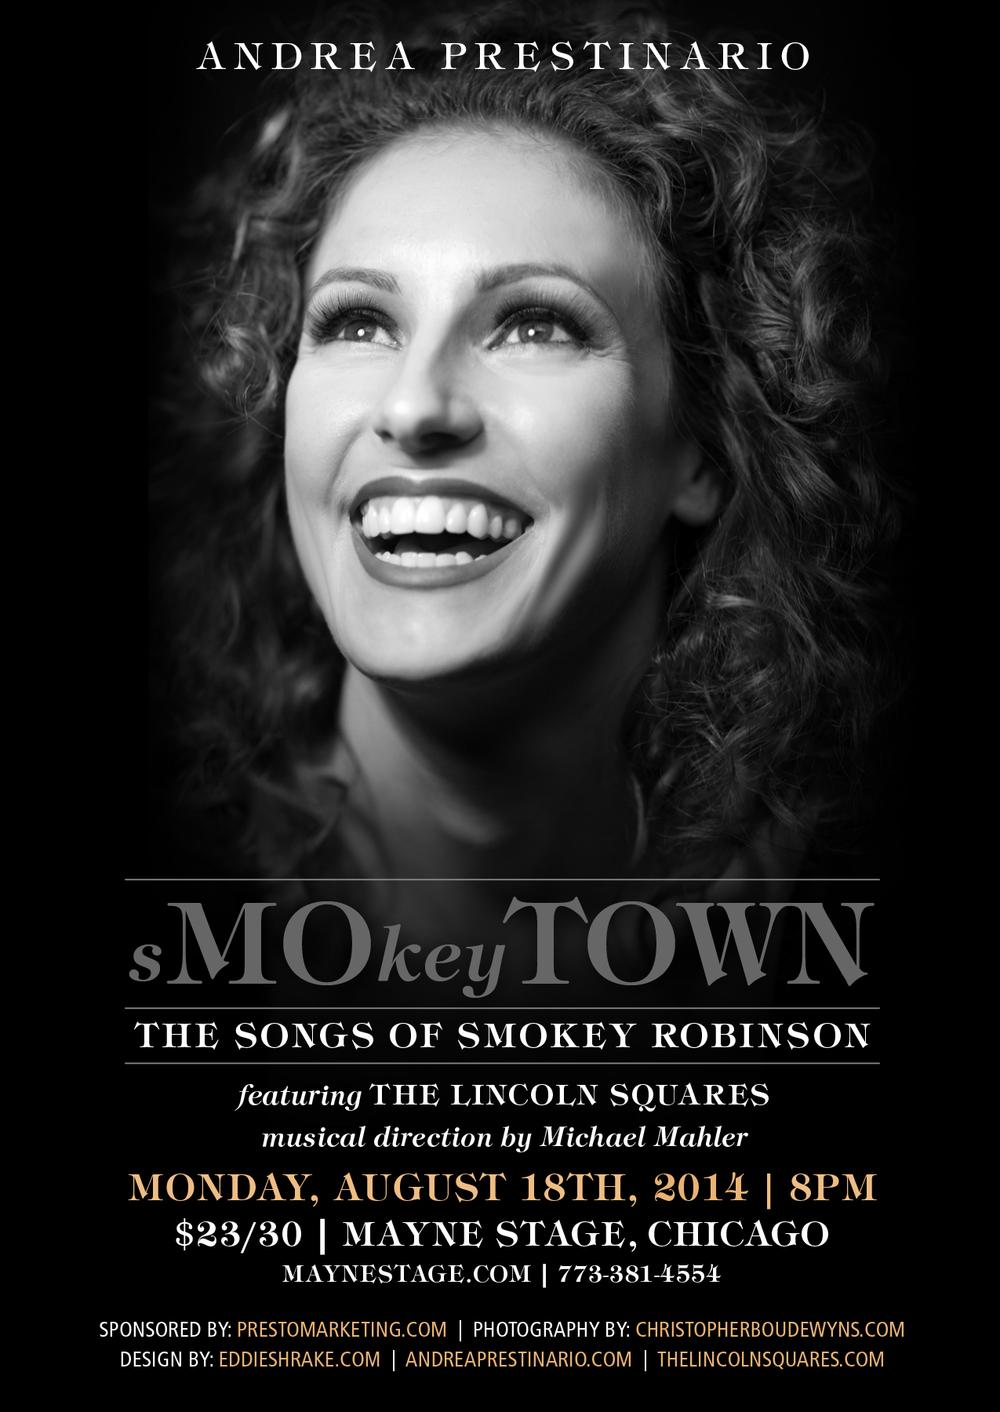 smokeytown-the-songs-of-smokey-robinson_18935315462_o.jpg